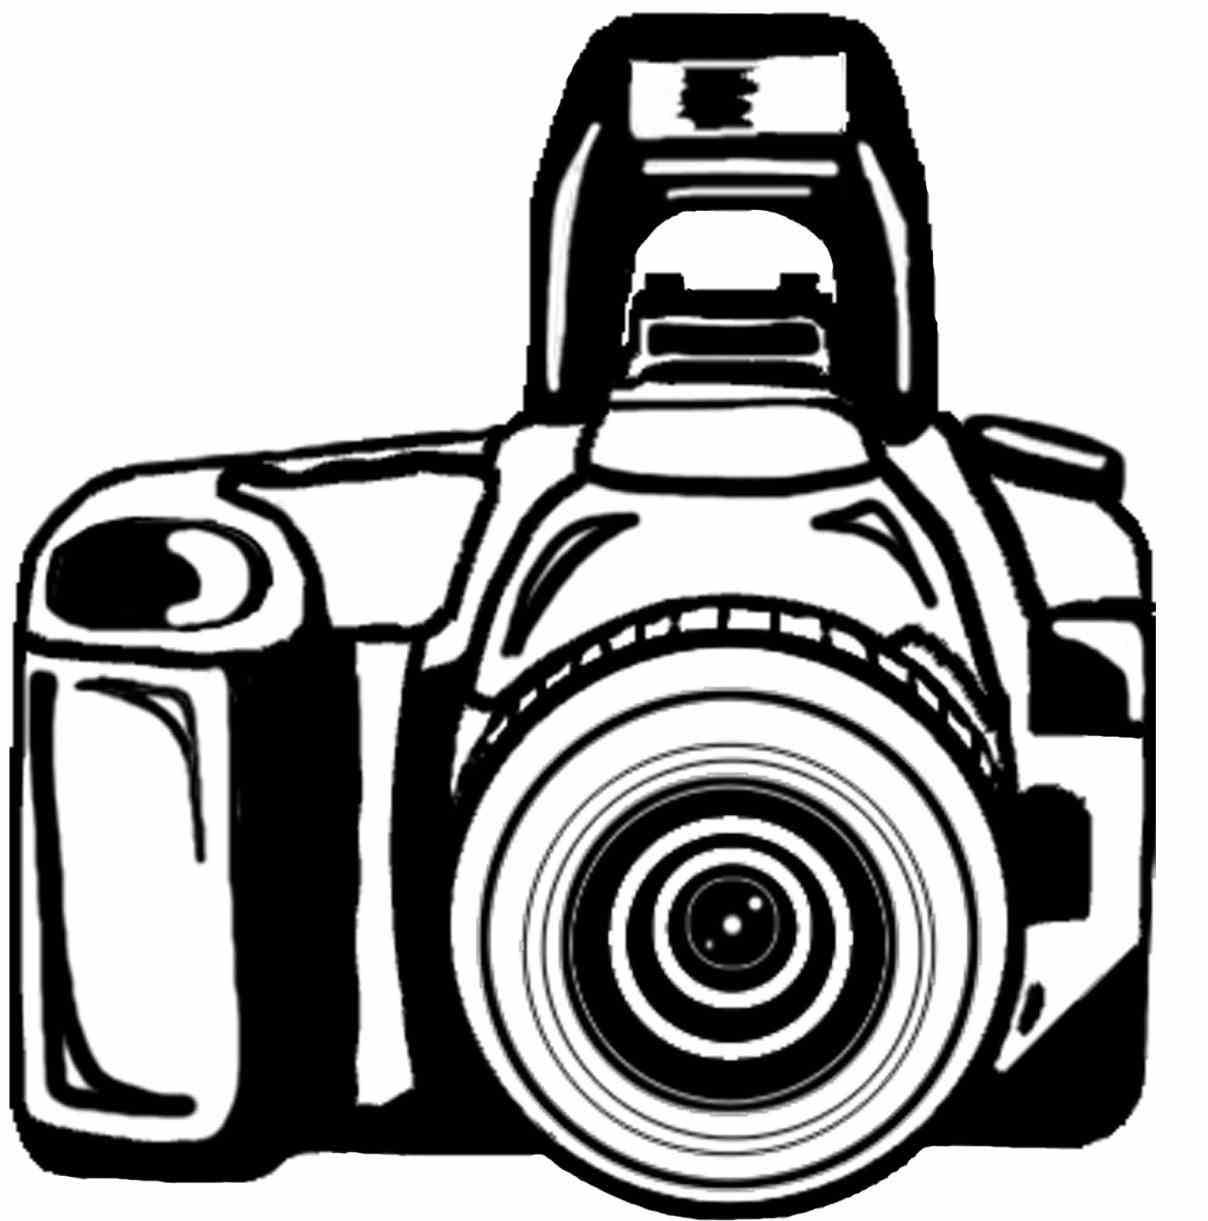 1208x1221 Camera Clipart Tumblr